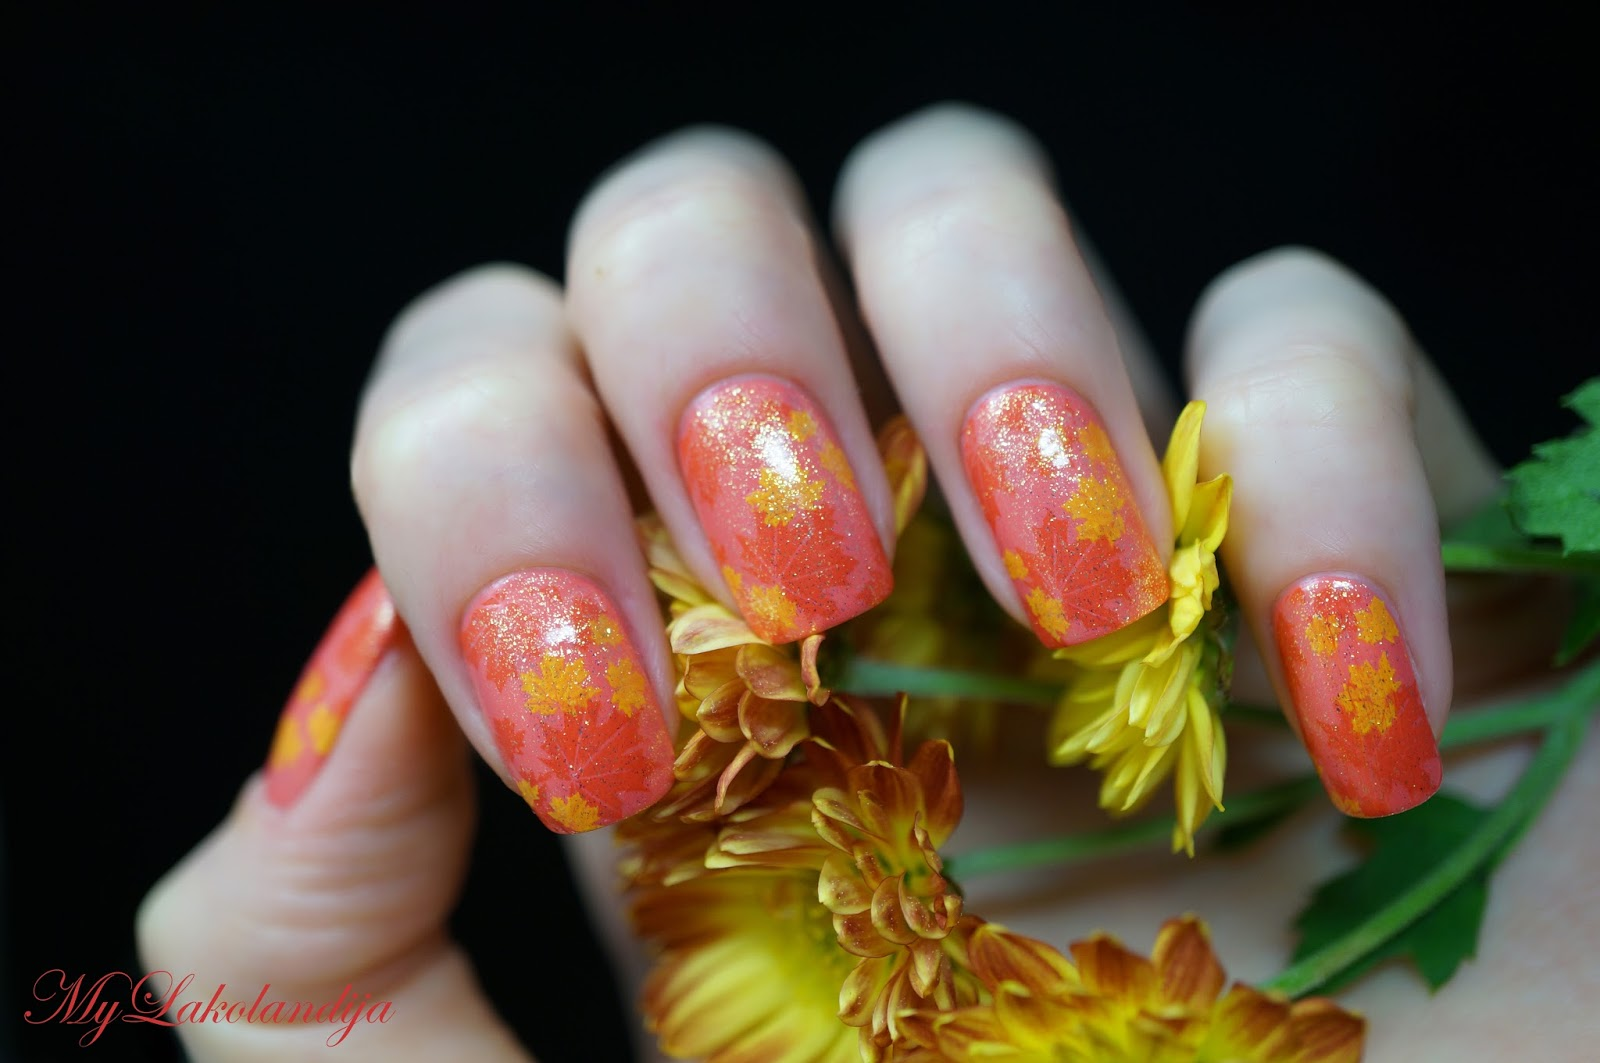 Рисунки на ногтях фото осенние листья